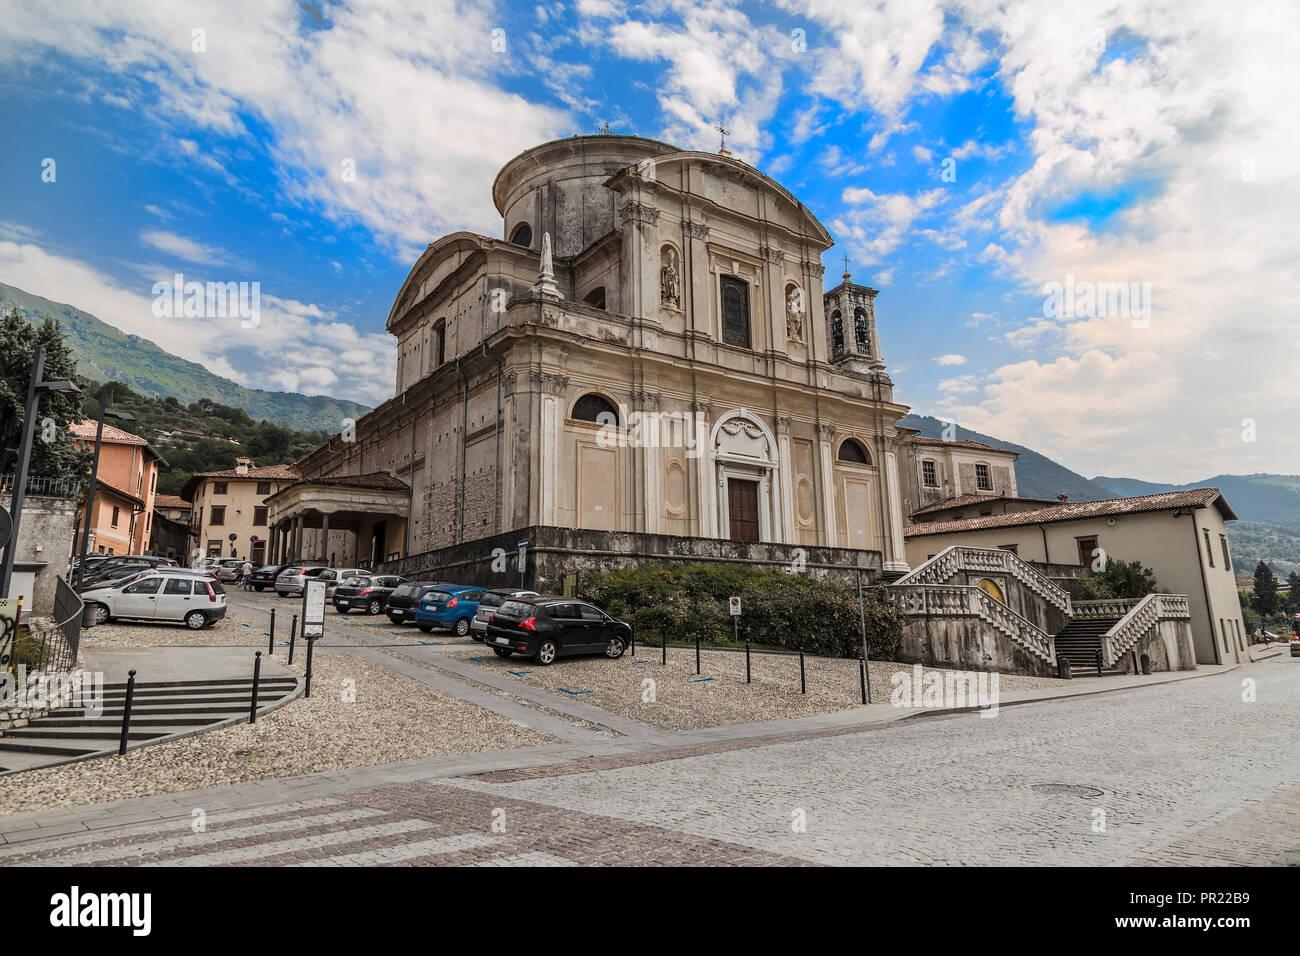 Former parish church of San Zenone in the municipality of Sale Marasino. Italy - Stock Image